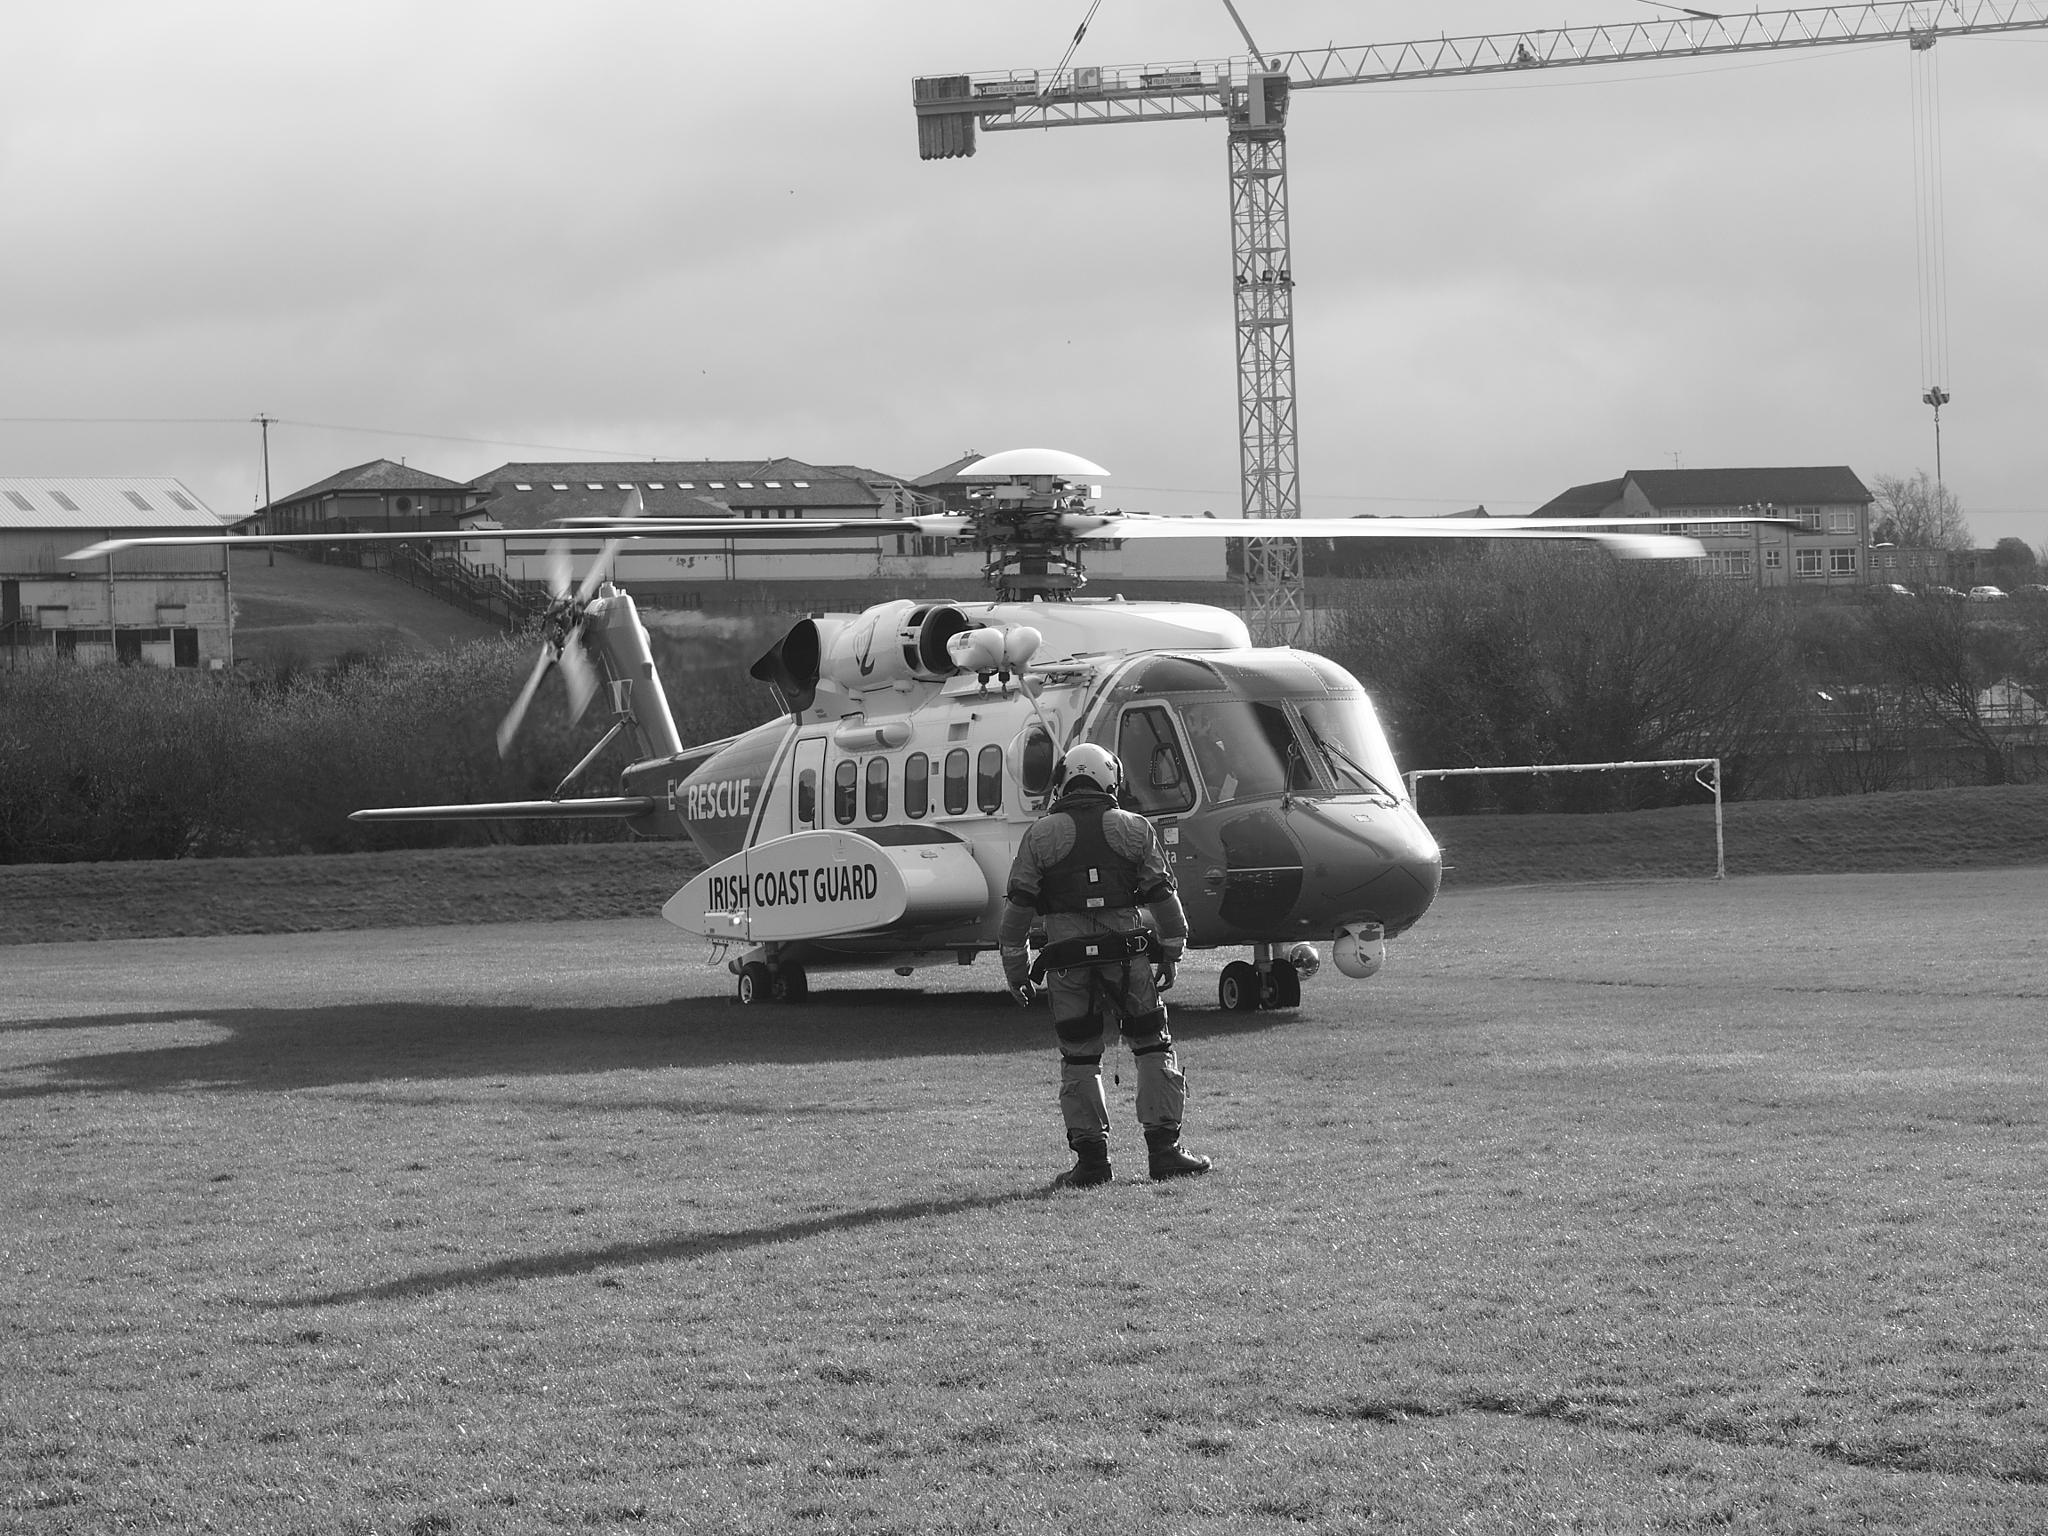 Irish Coast Guard by Hailceaser